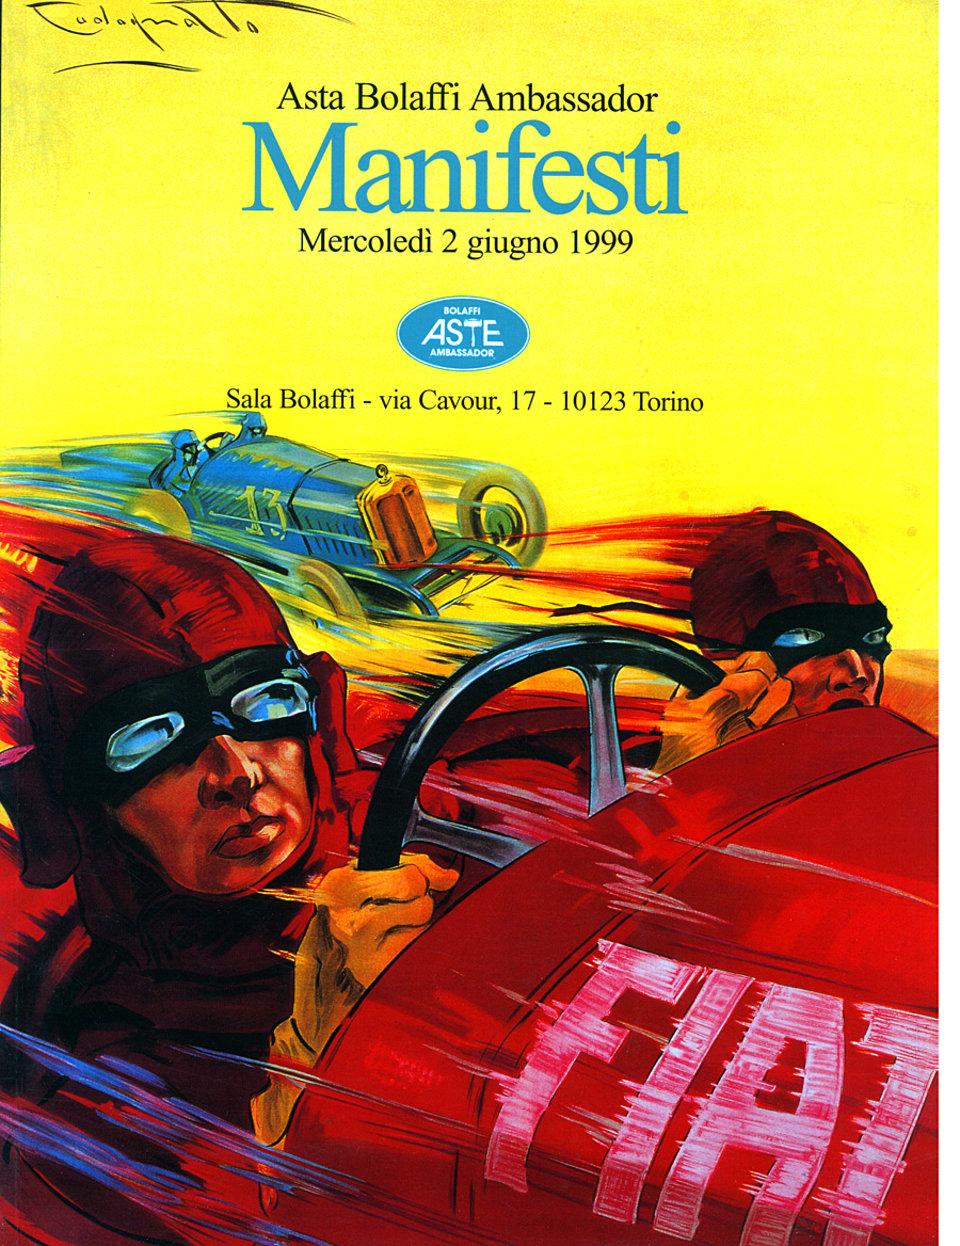 Asta Bolaffi Ambassador: Manifesti 1999 Italian Catalog